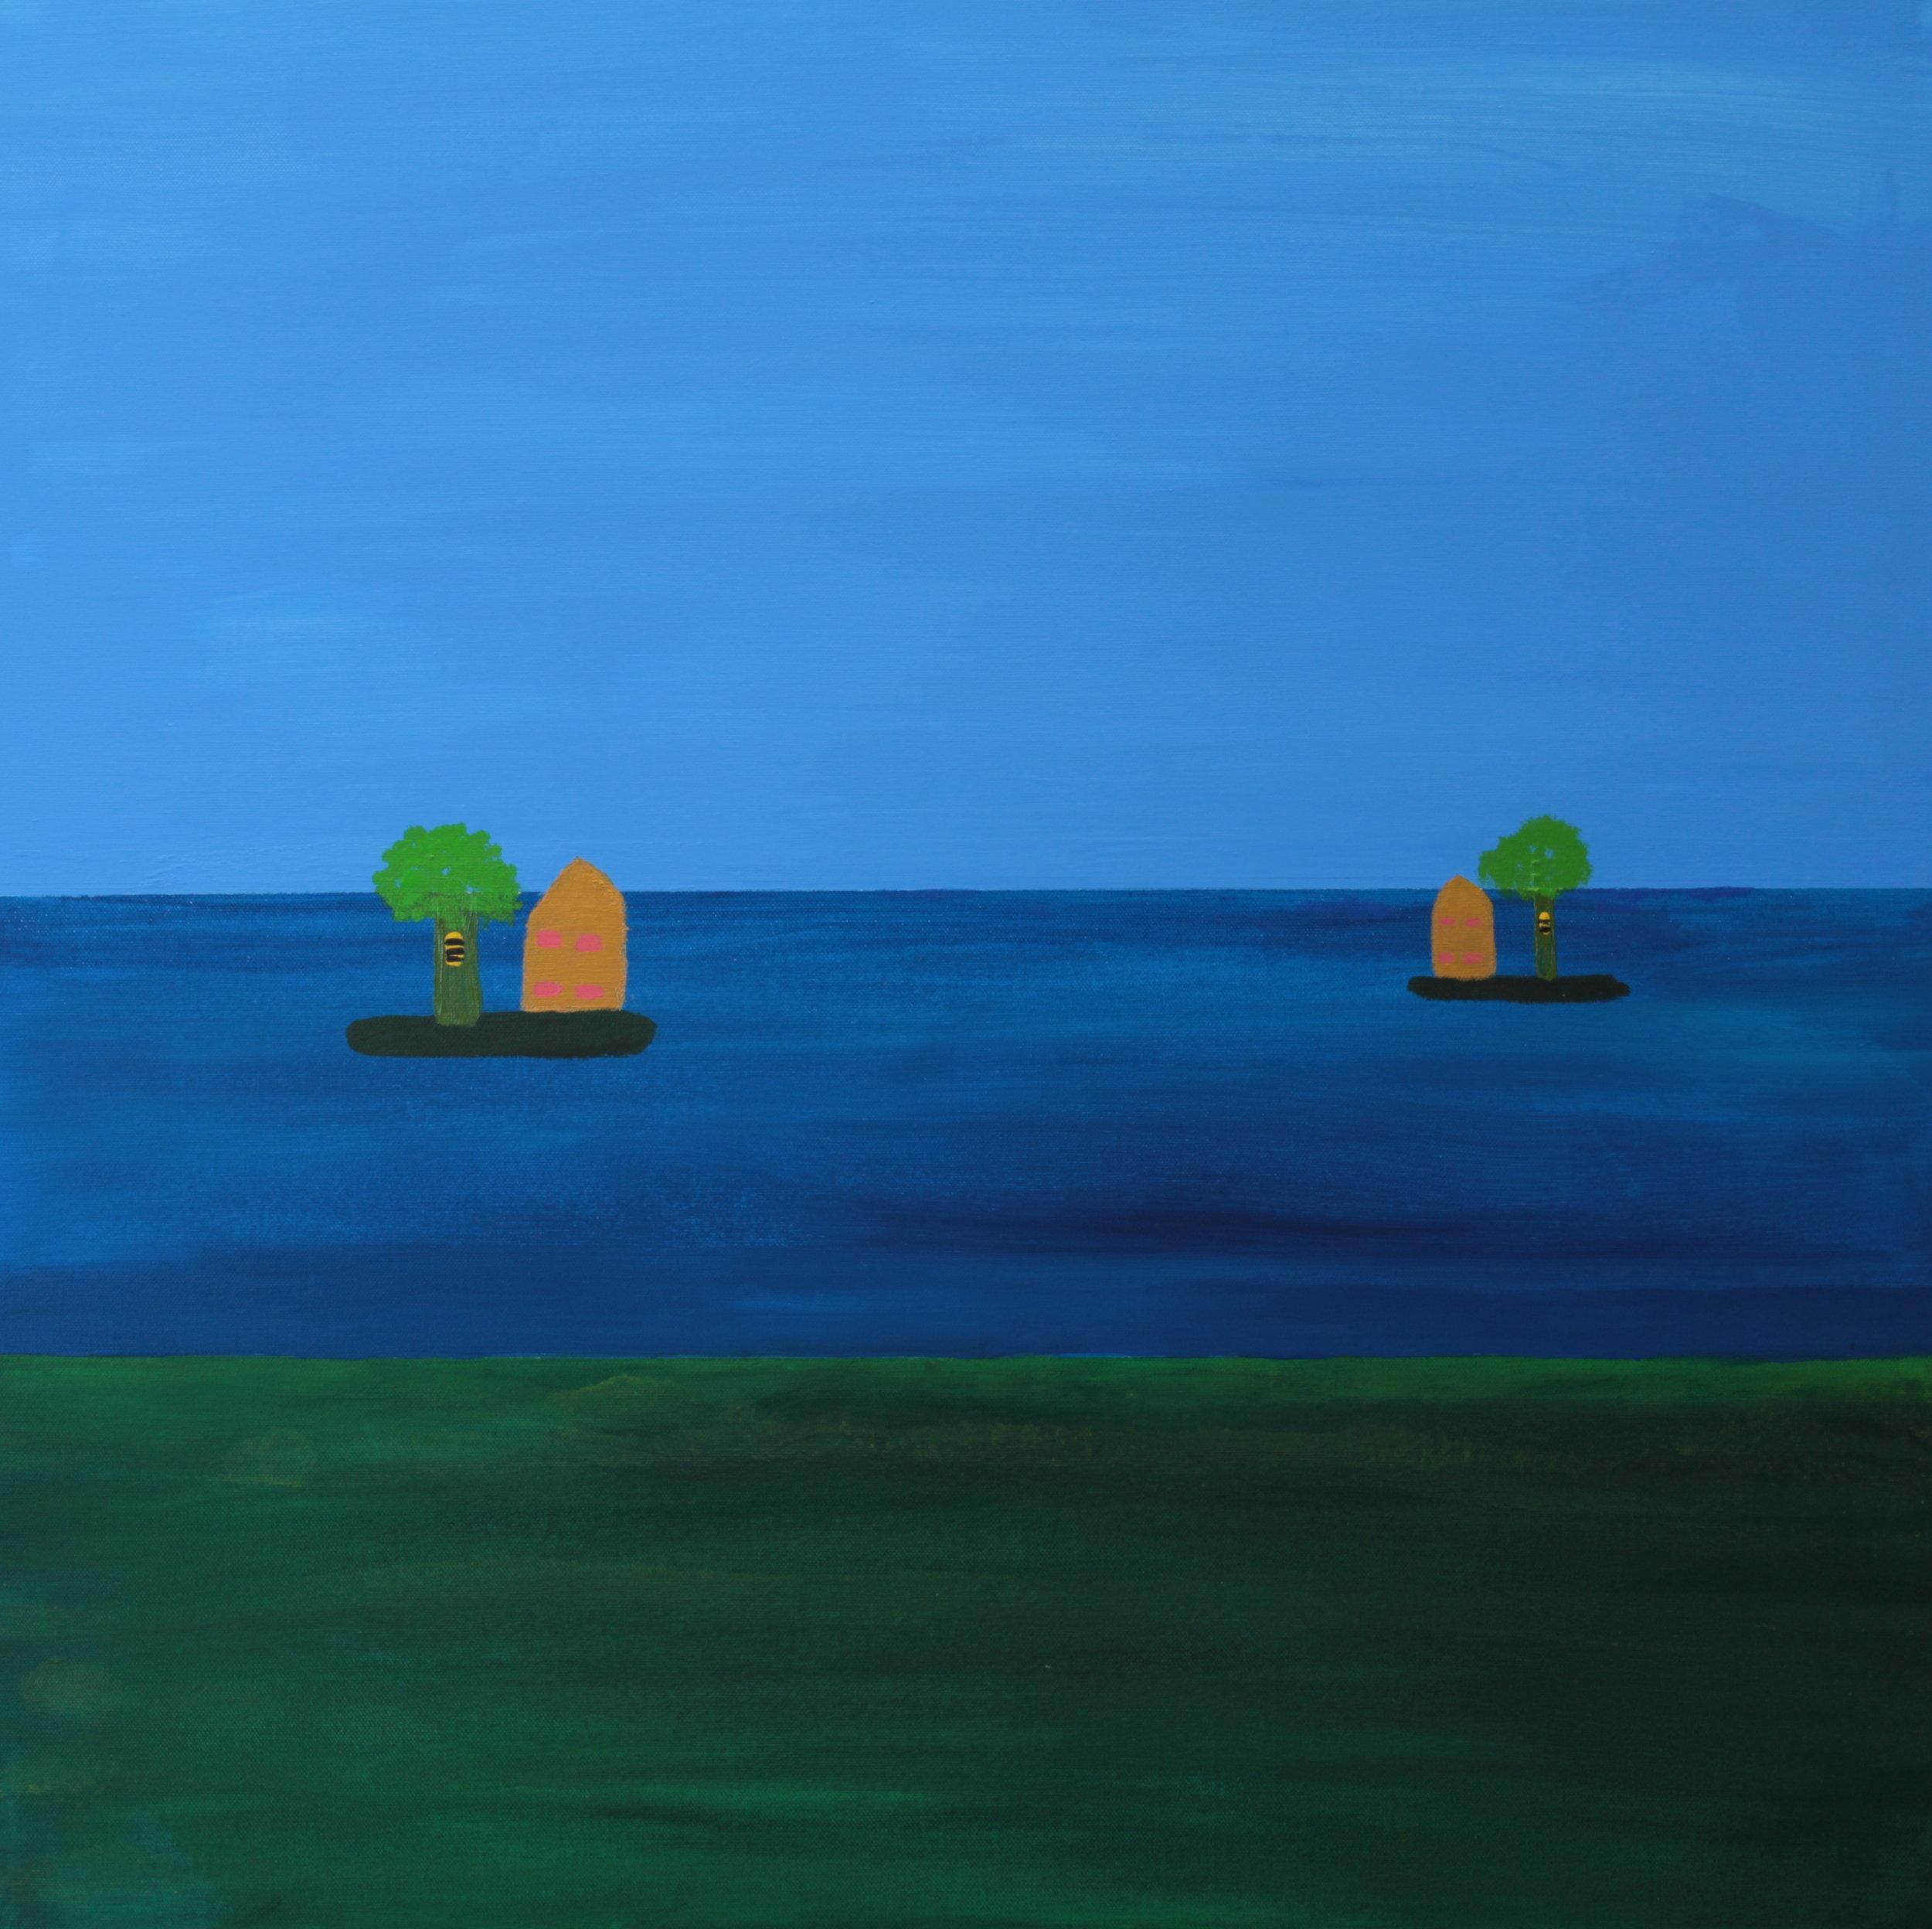 12 2014 Beehives on Islands Acrylic on Canvas 76 X 76cm Yaniv Janson.JPG